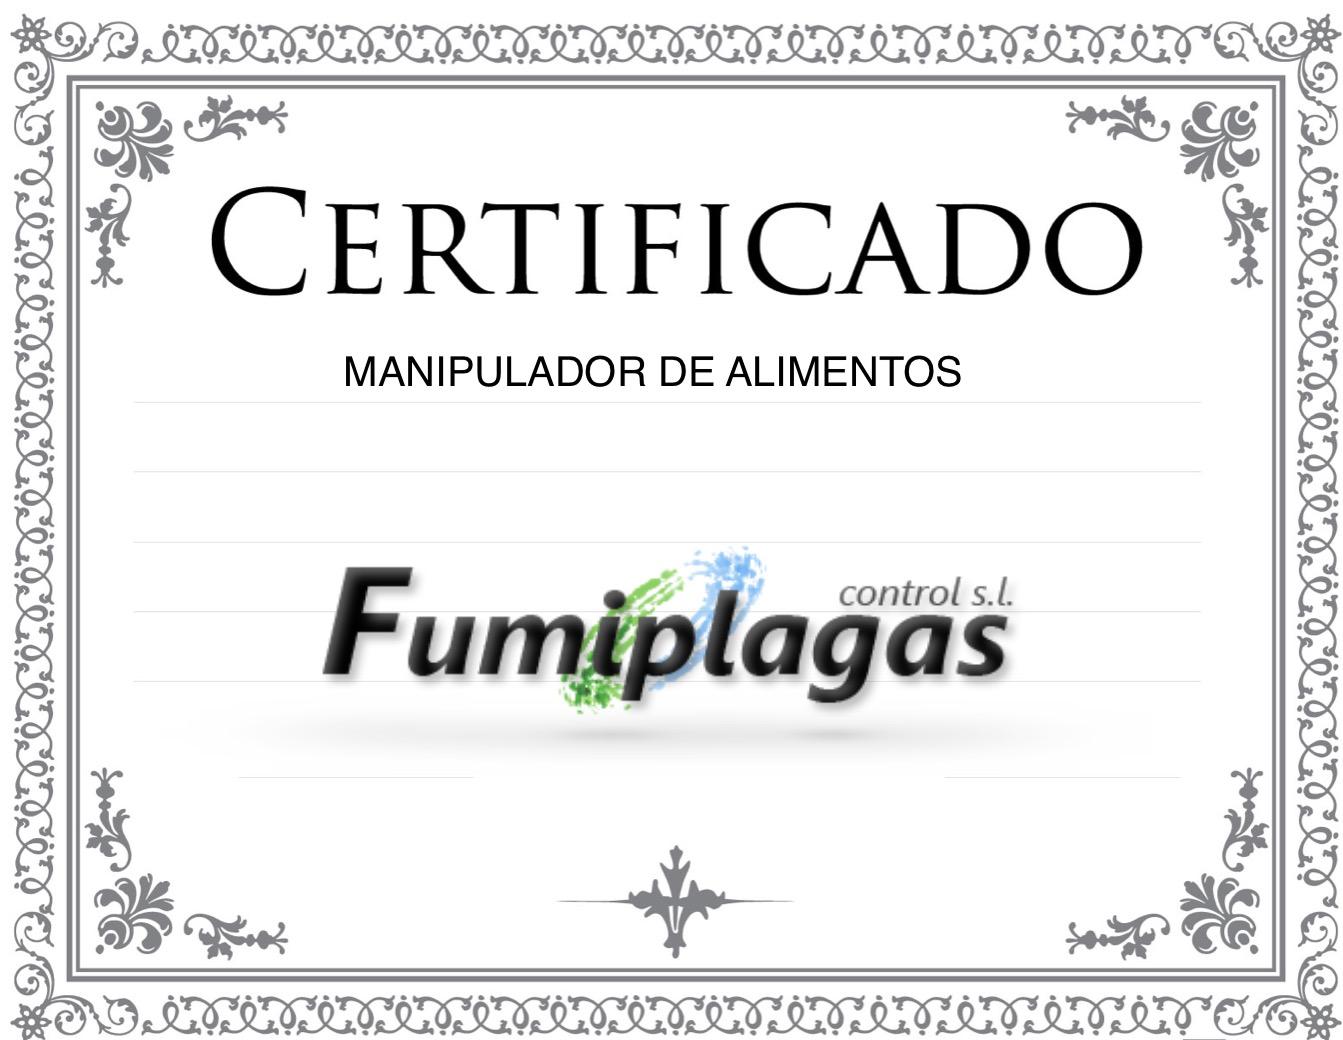 El manipulador de alimentos share the knownledge - Carnet de manipulador de alimentos homologado ...